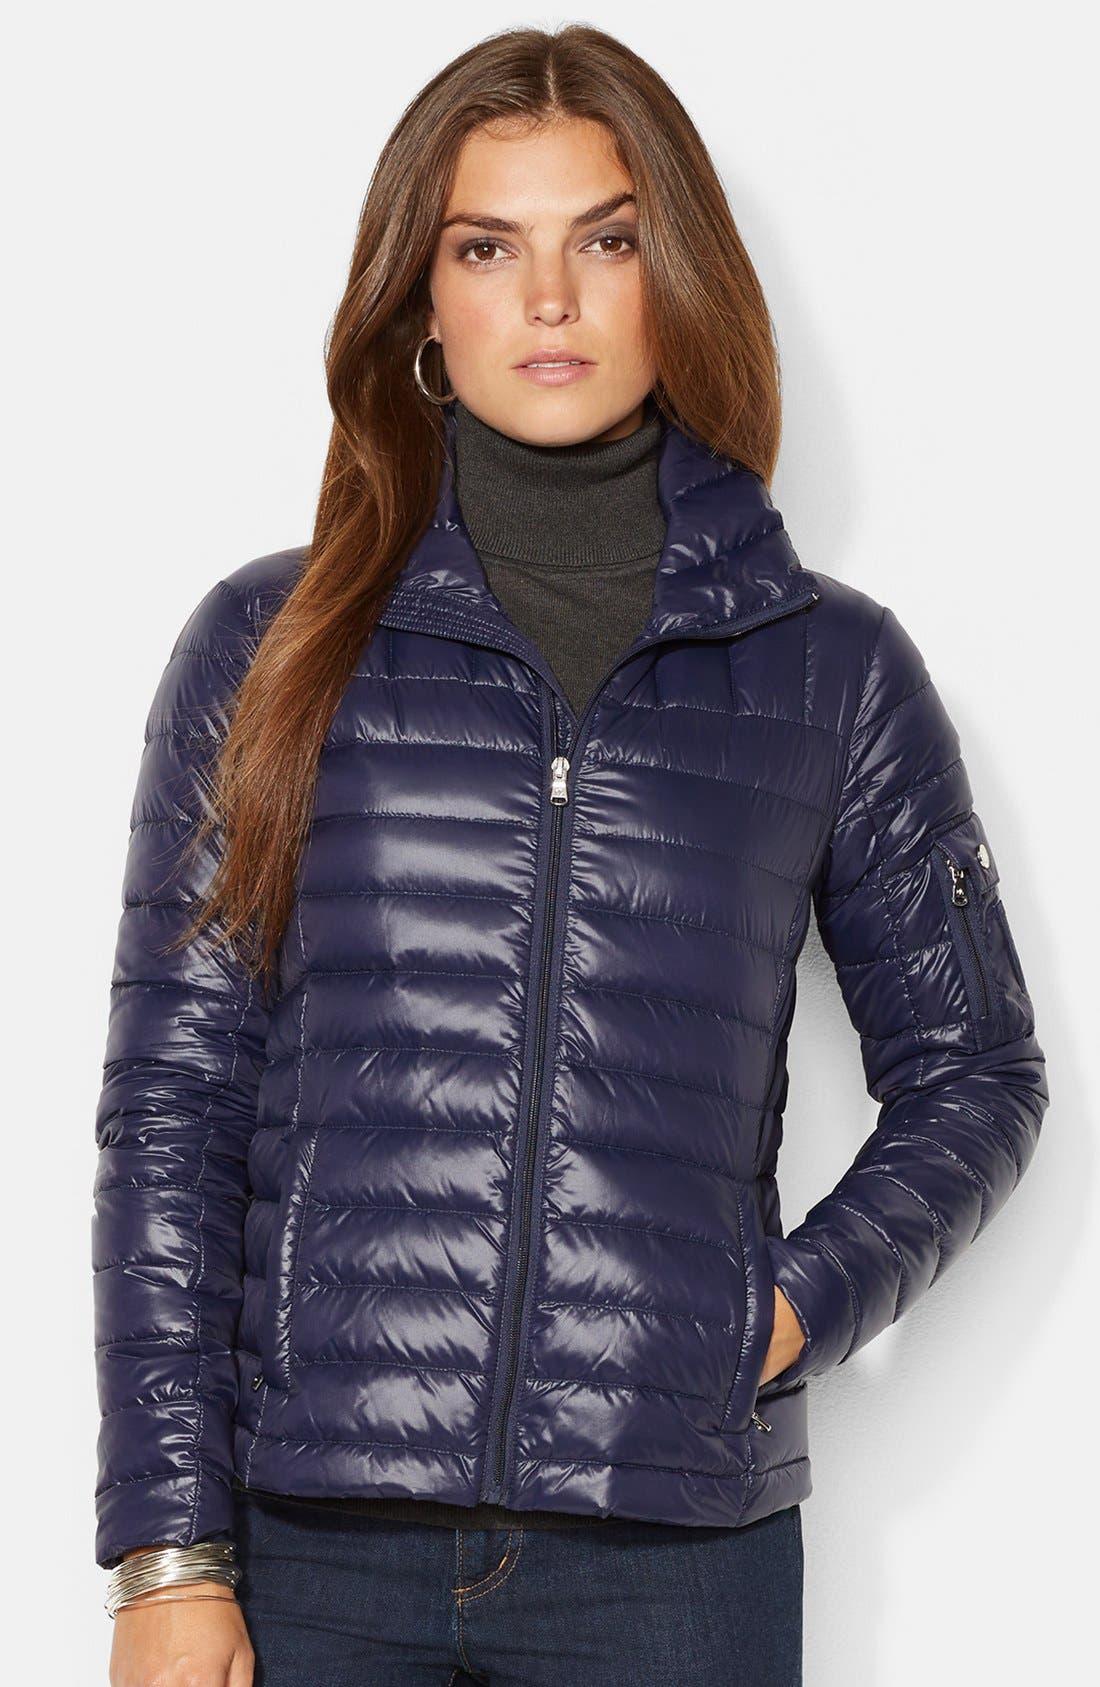 Alternate Image 1 Selected - Lauren Ralph Lauren Shirttail Packable Down Jacket (Online Only)